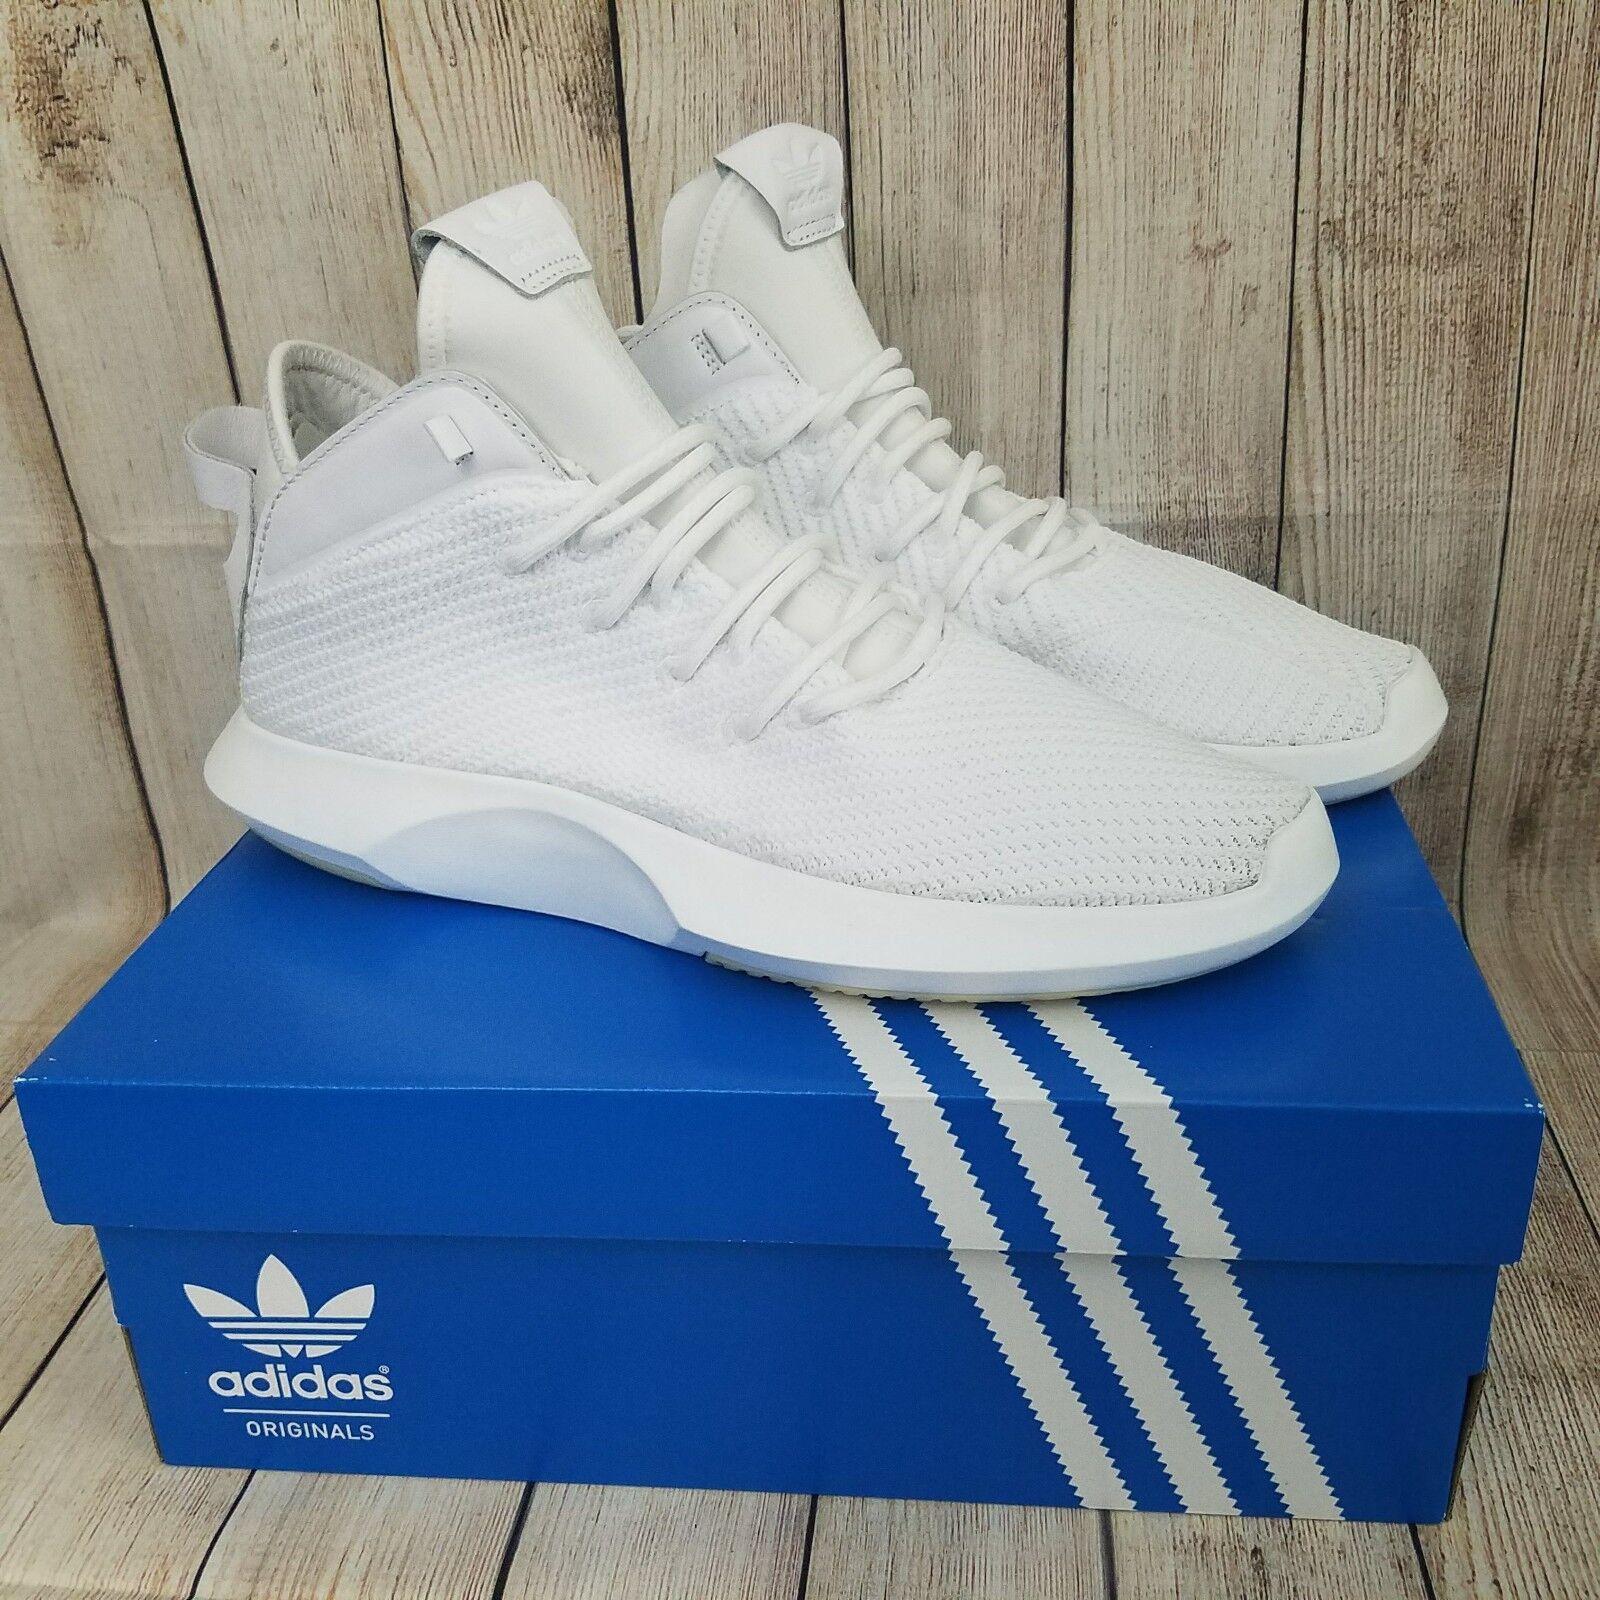 Adidas Crazy 1 Adv PK Primeknit White Basketball Shoes Men's Comfortable